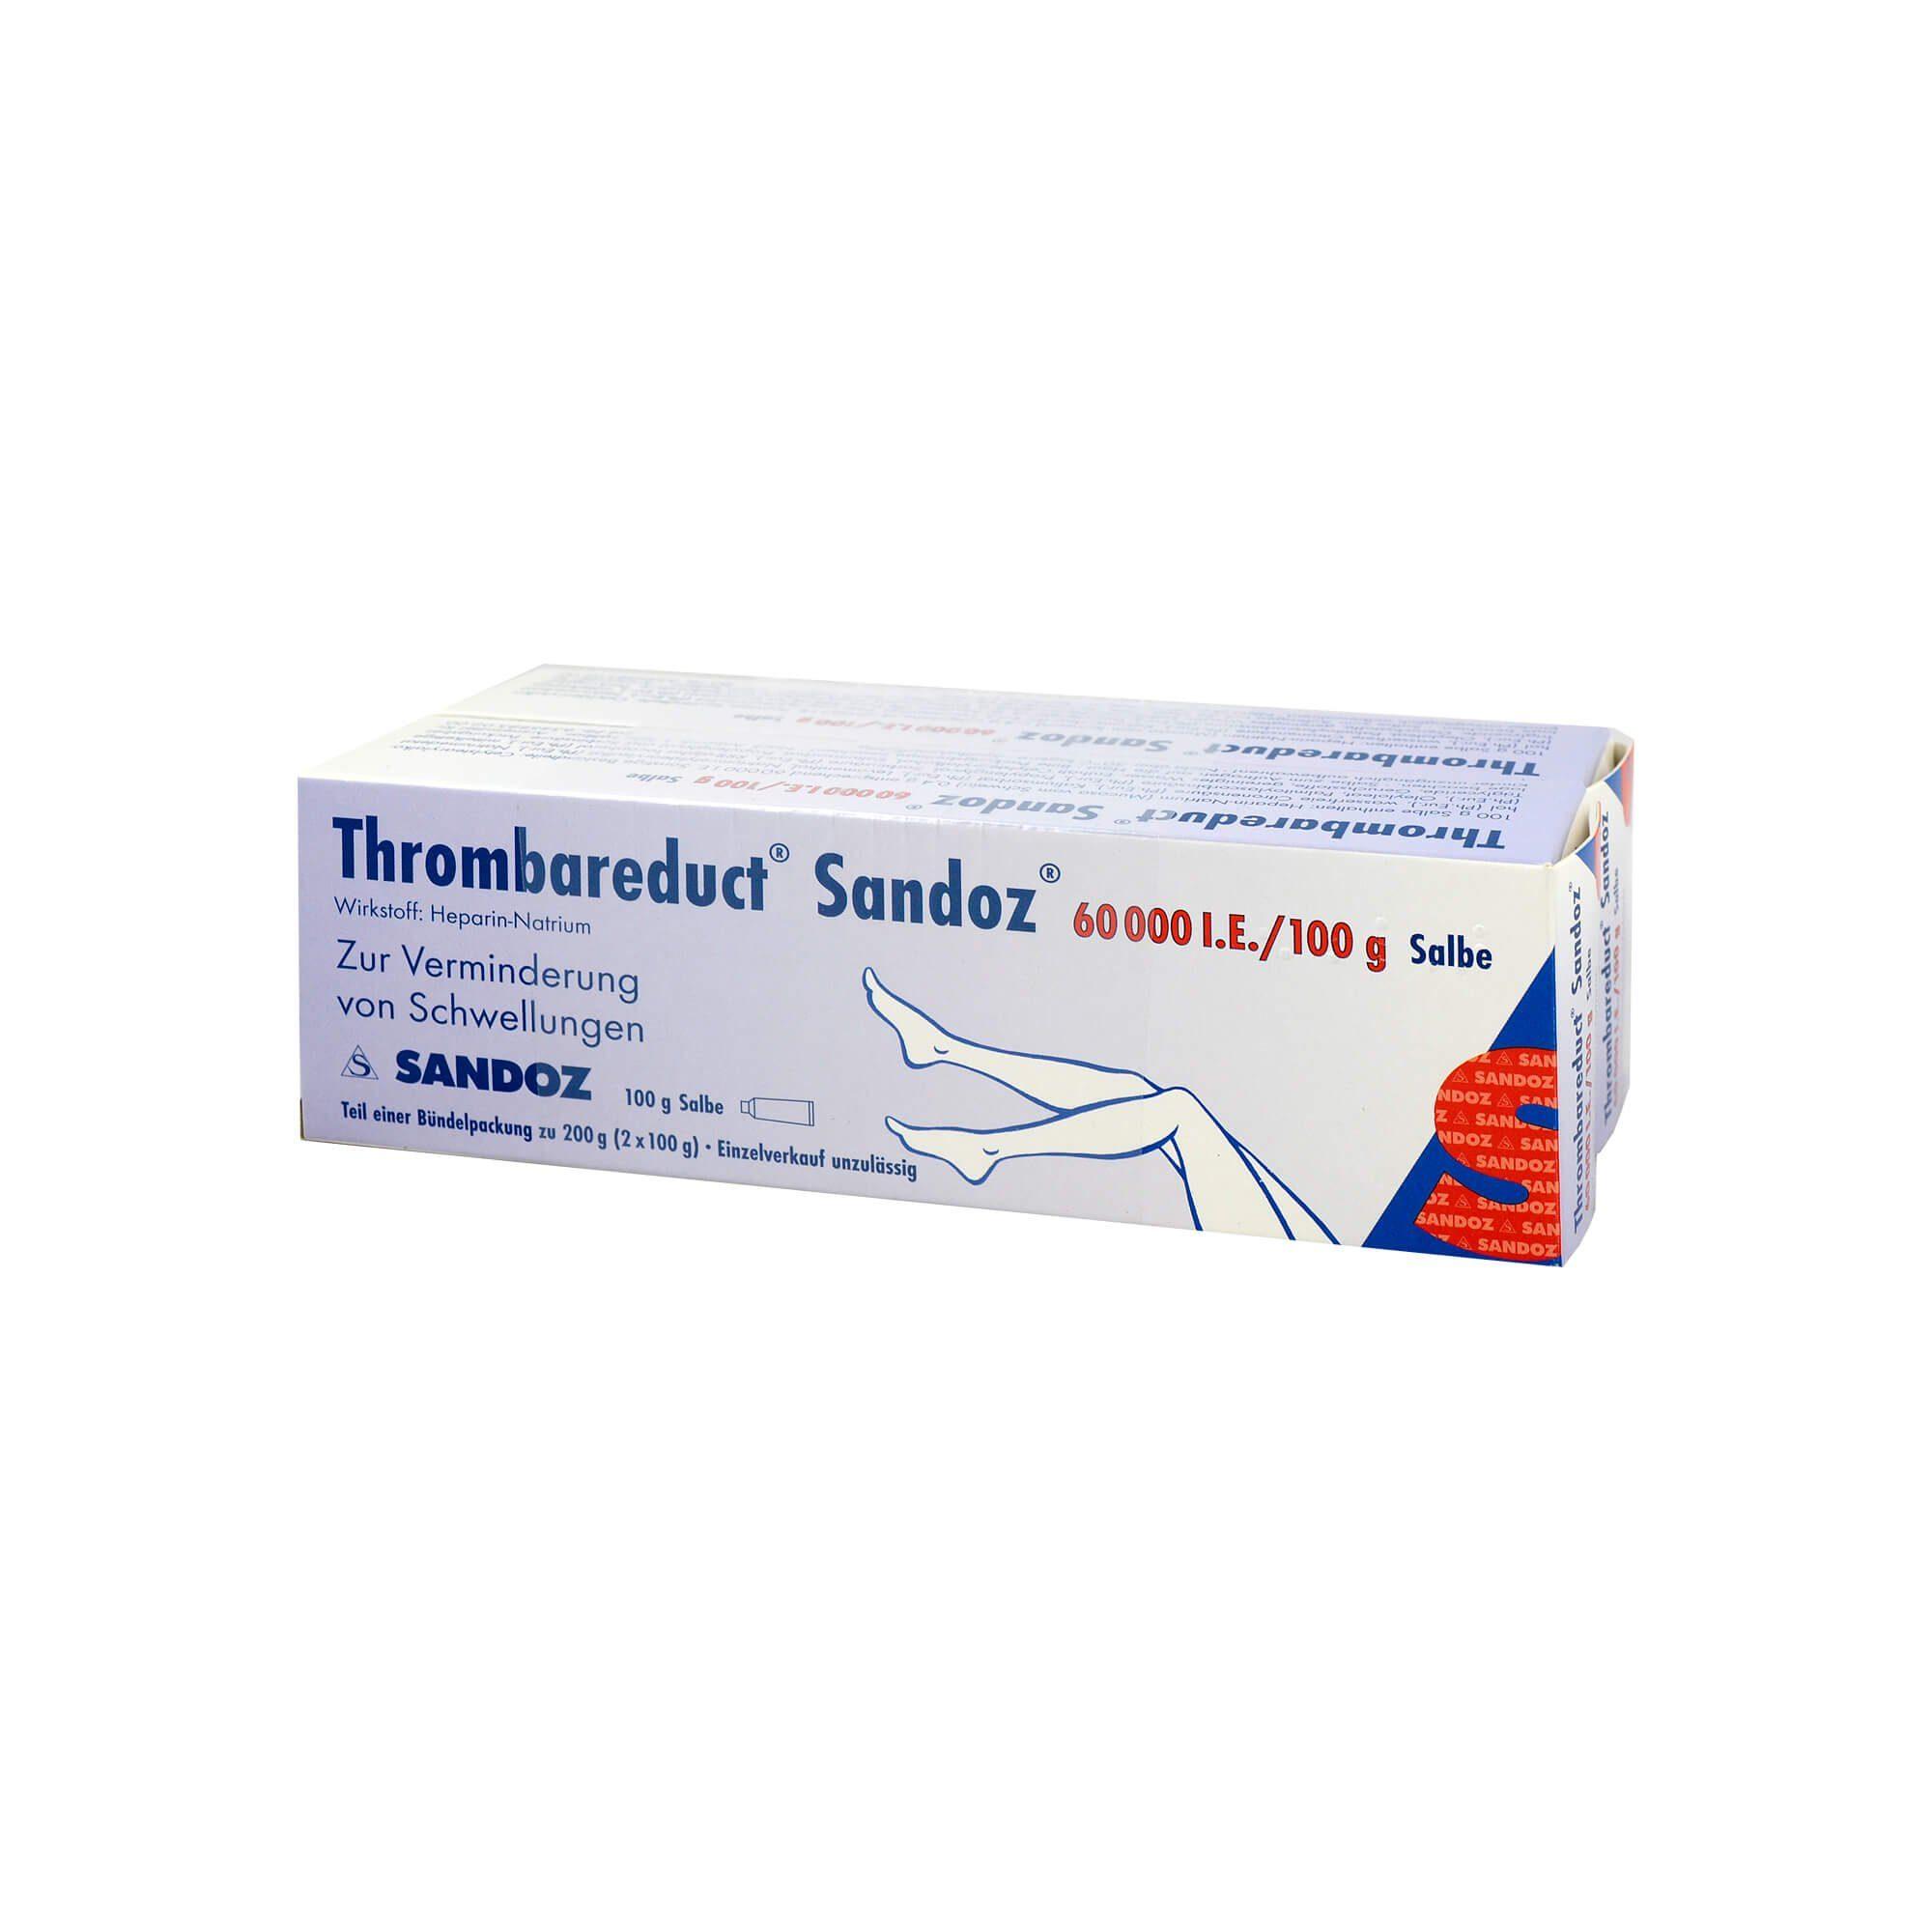 Thrombareduct Sandoz 60. 000 I.E. Salbe , 200 g